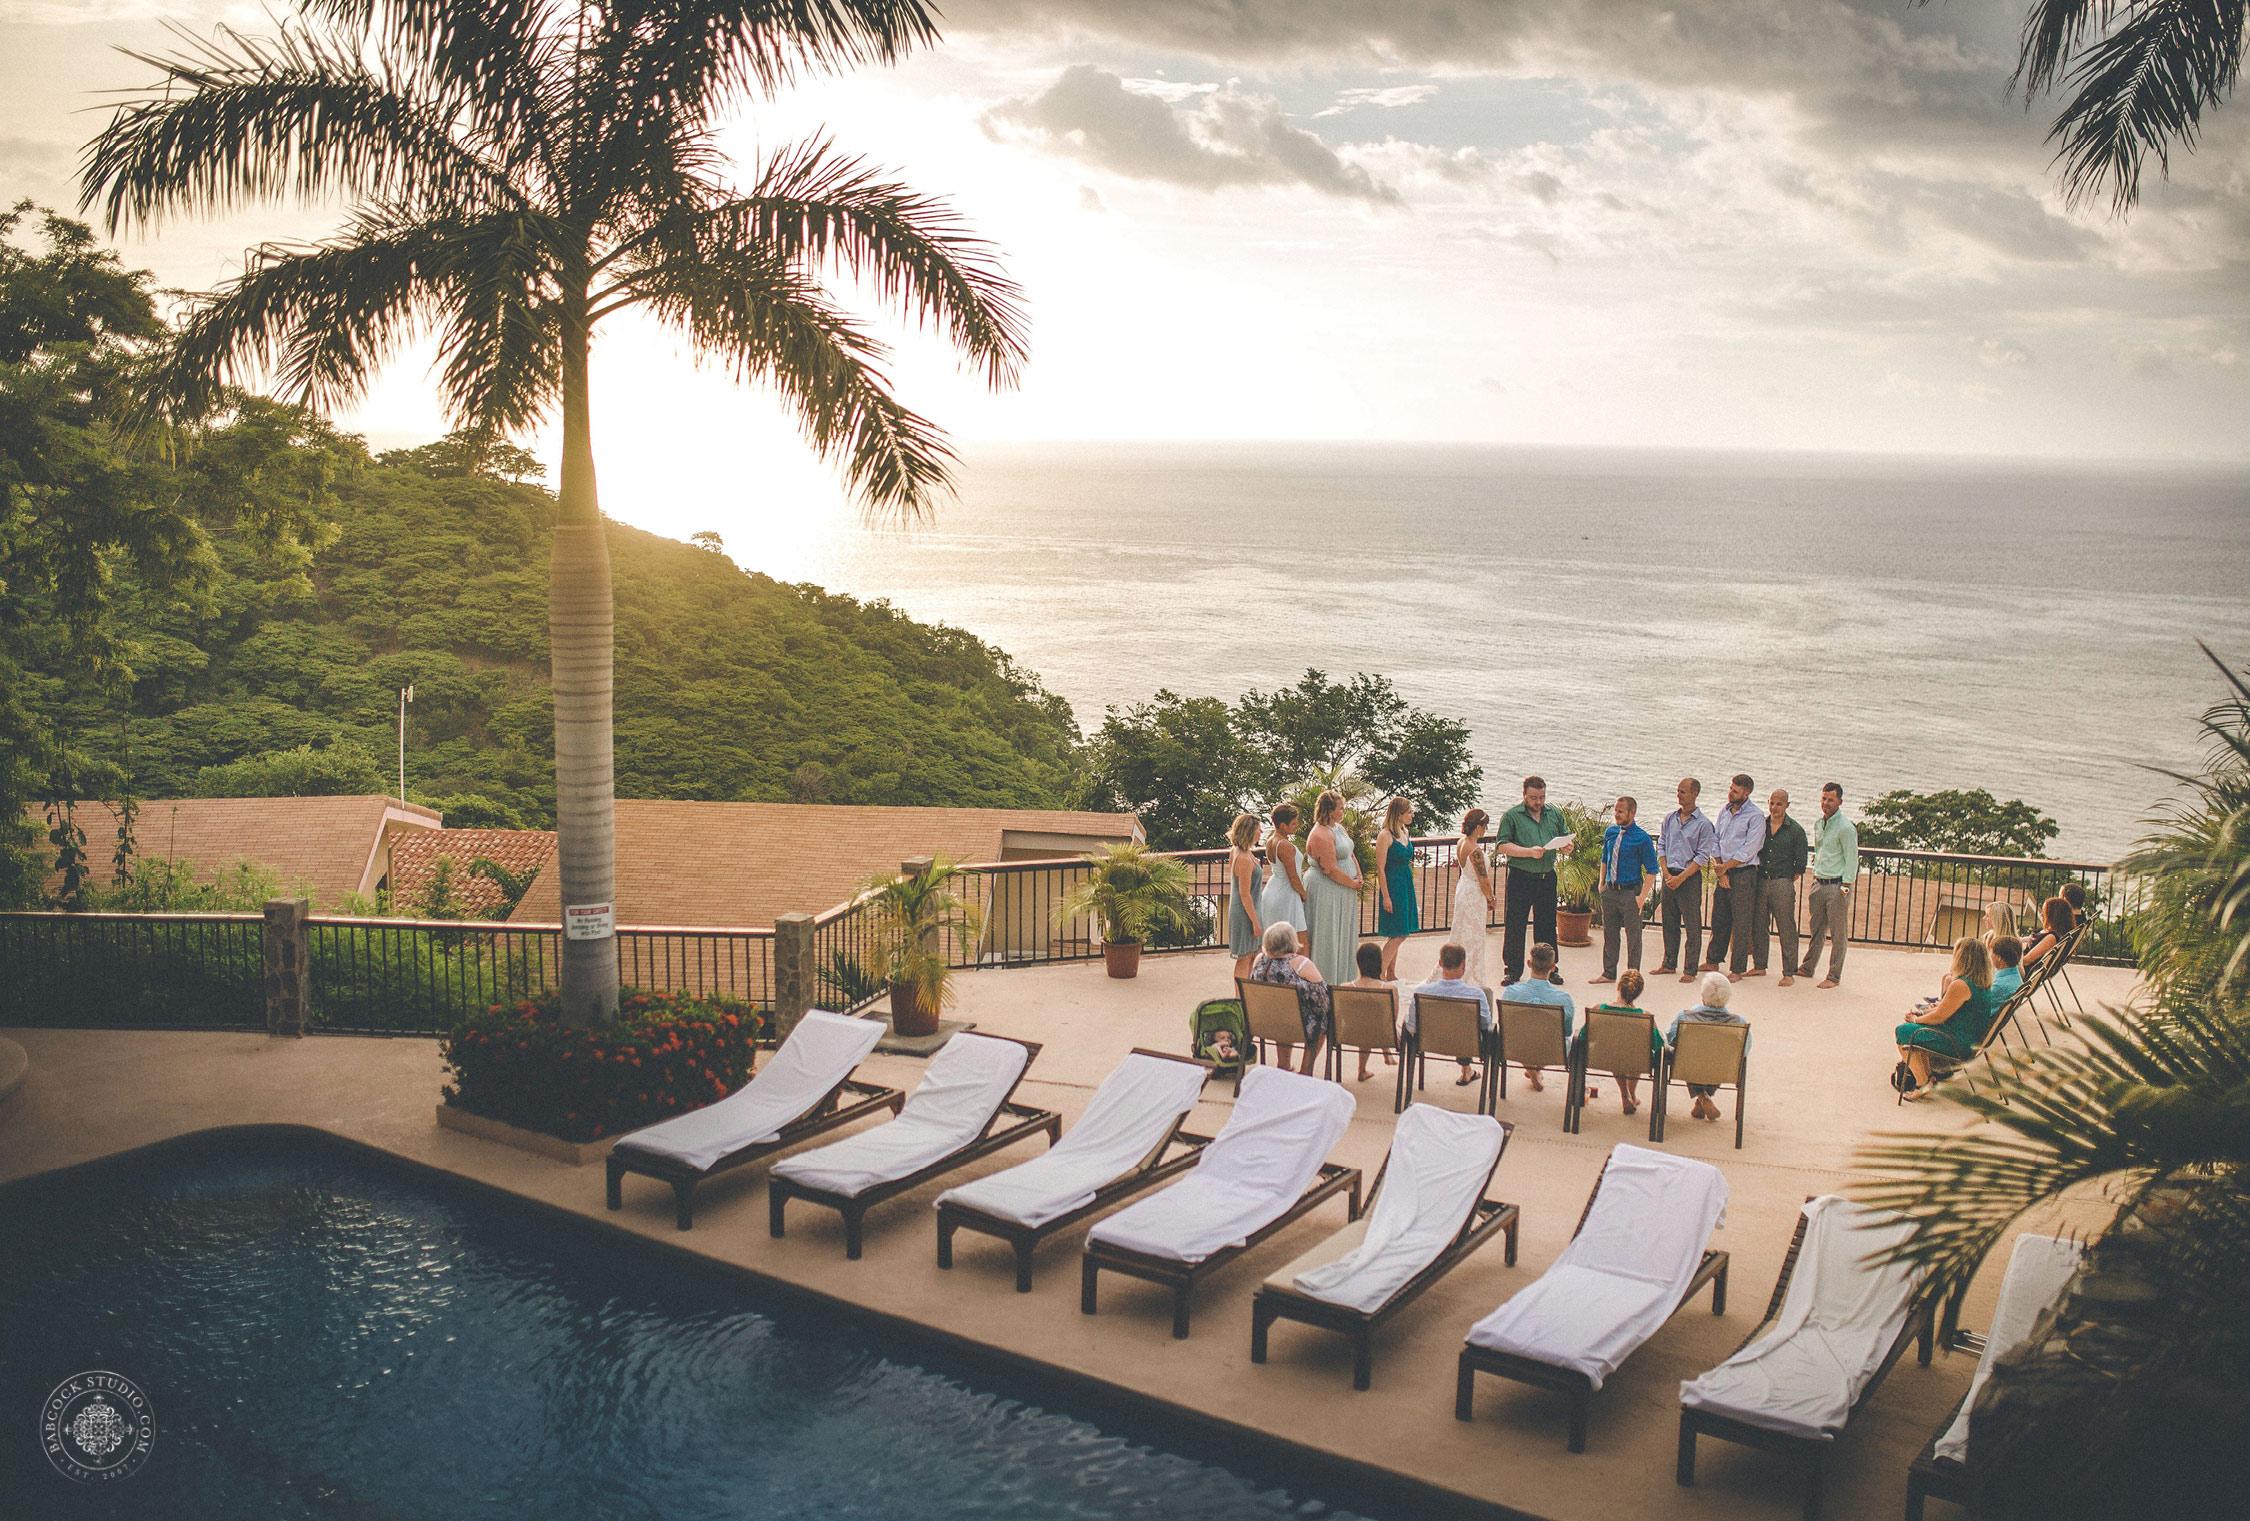 2cat-brandon-costa-rica-destination-wedding-photographer-dayton-ohio-18.jpg